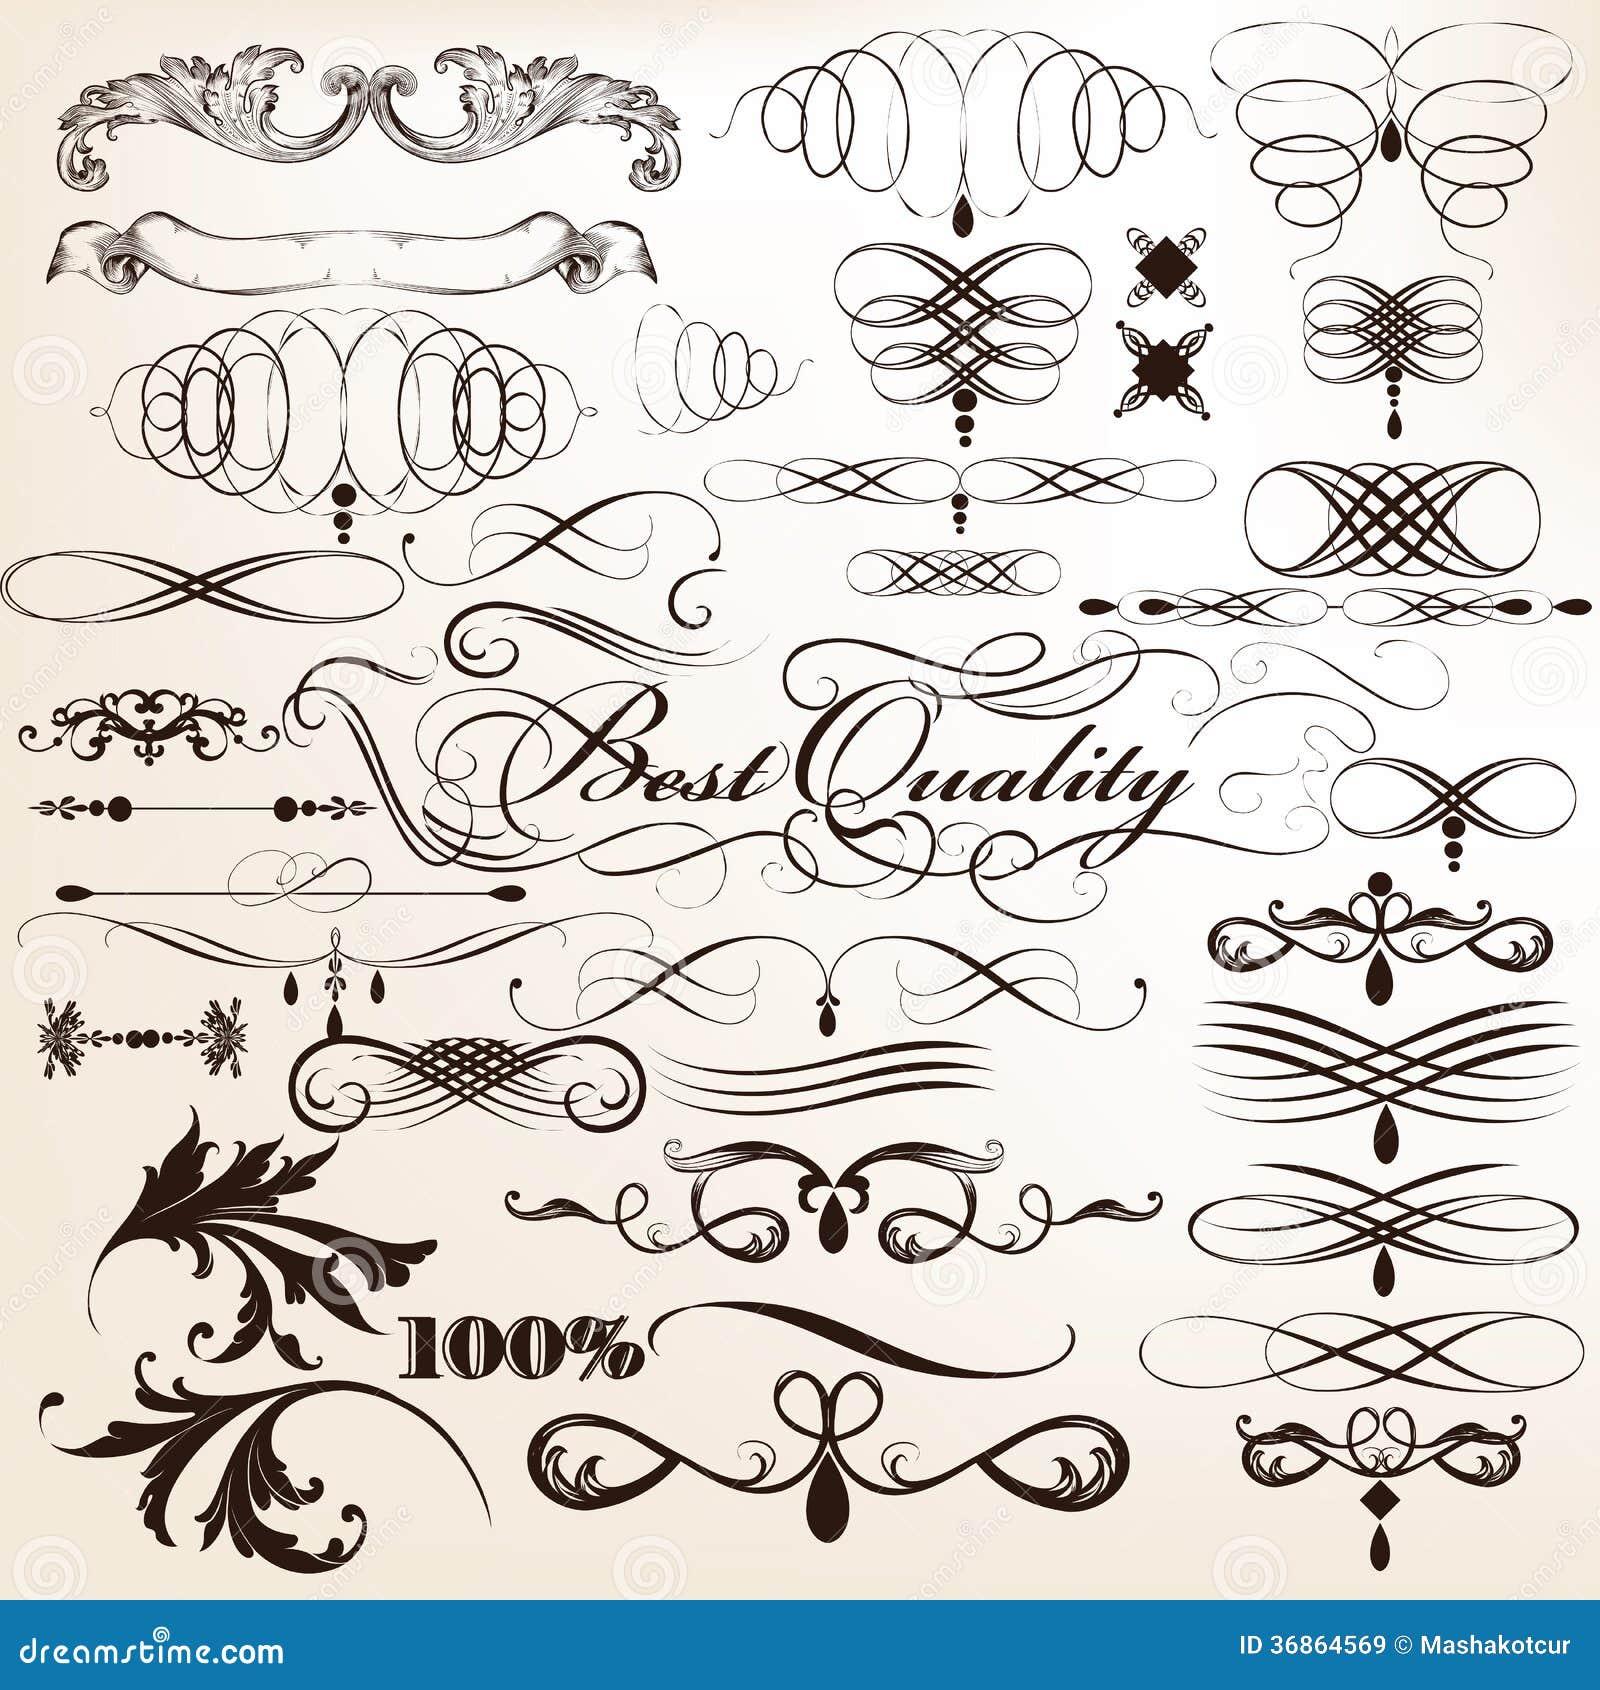 250  Free Vintage Graphics: Flourish Vector Ornaments